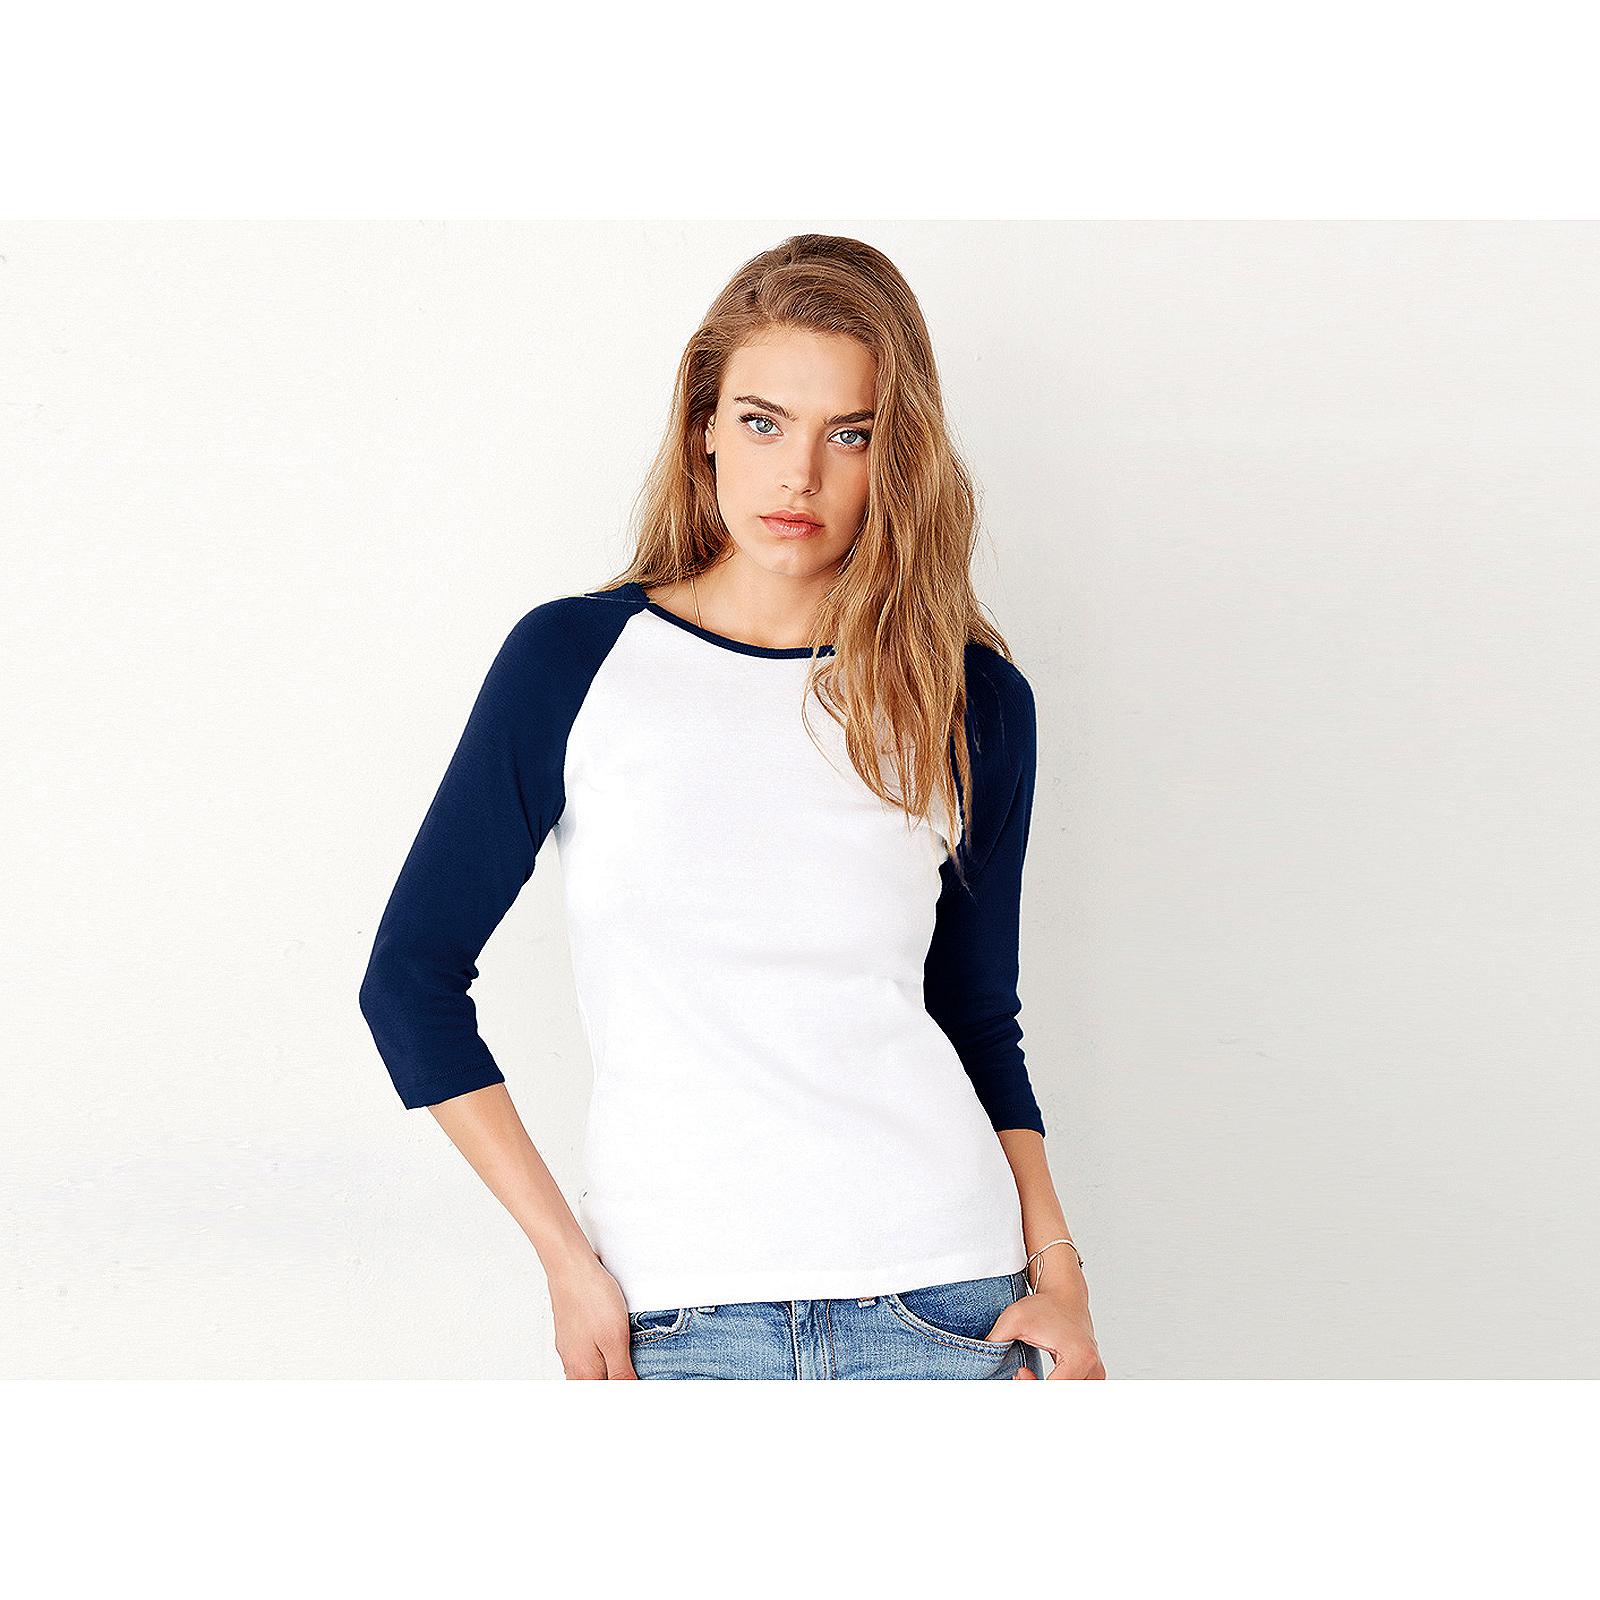 db1e1064ae1248 Sentinel Canvas Baby Rib Knit 3/4 Sleeve Contrast Raglan T Shirt Cotton  Ladies Fitted Top